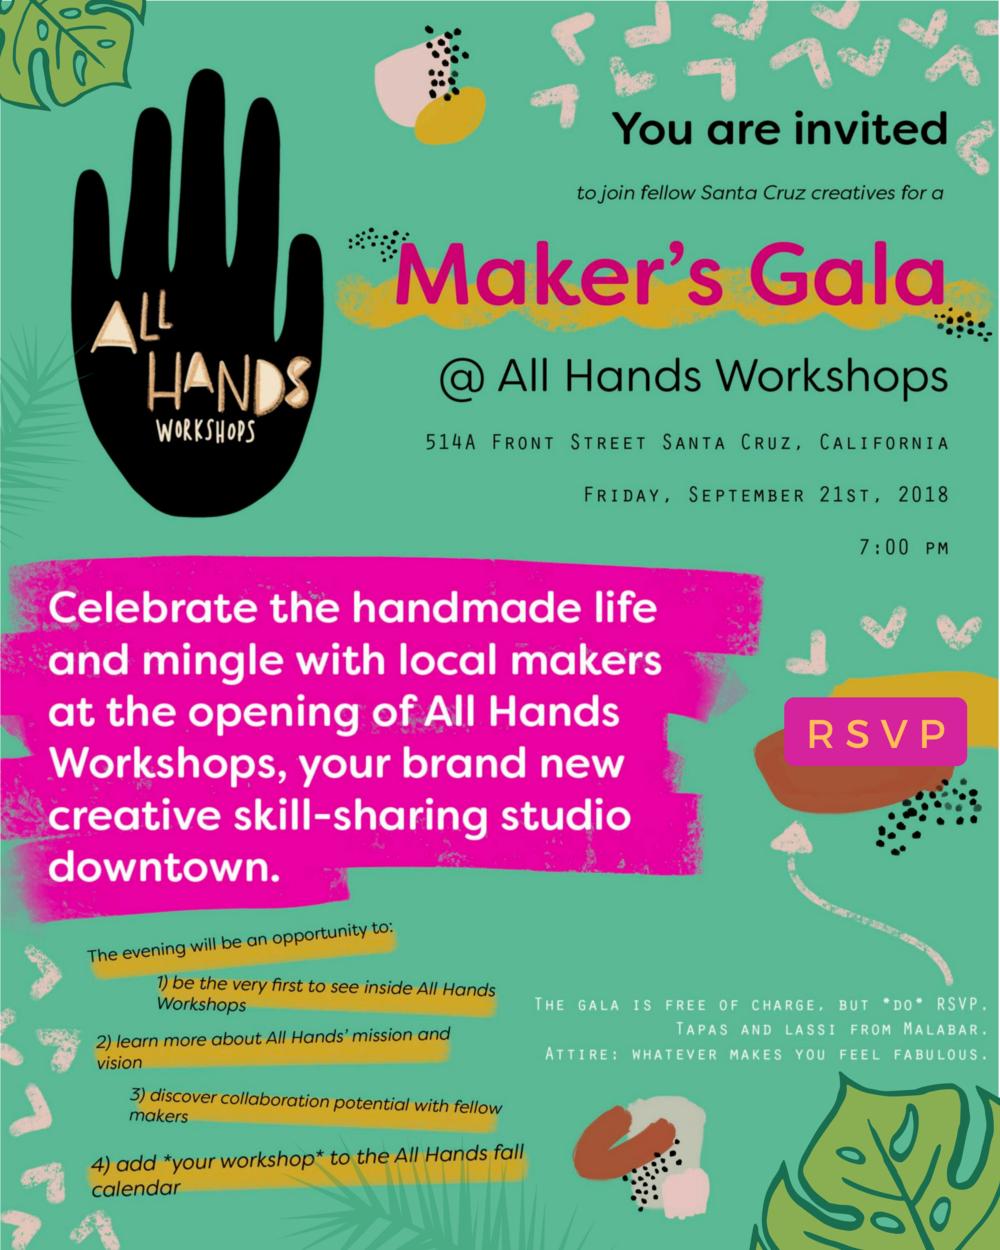 canva maker's gala invite.png